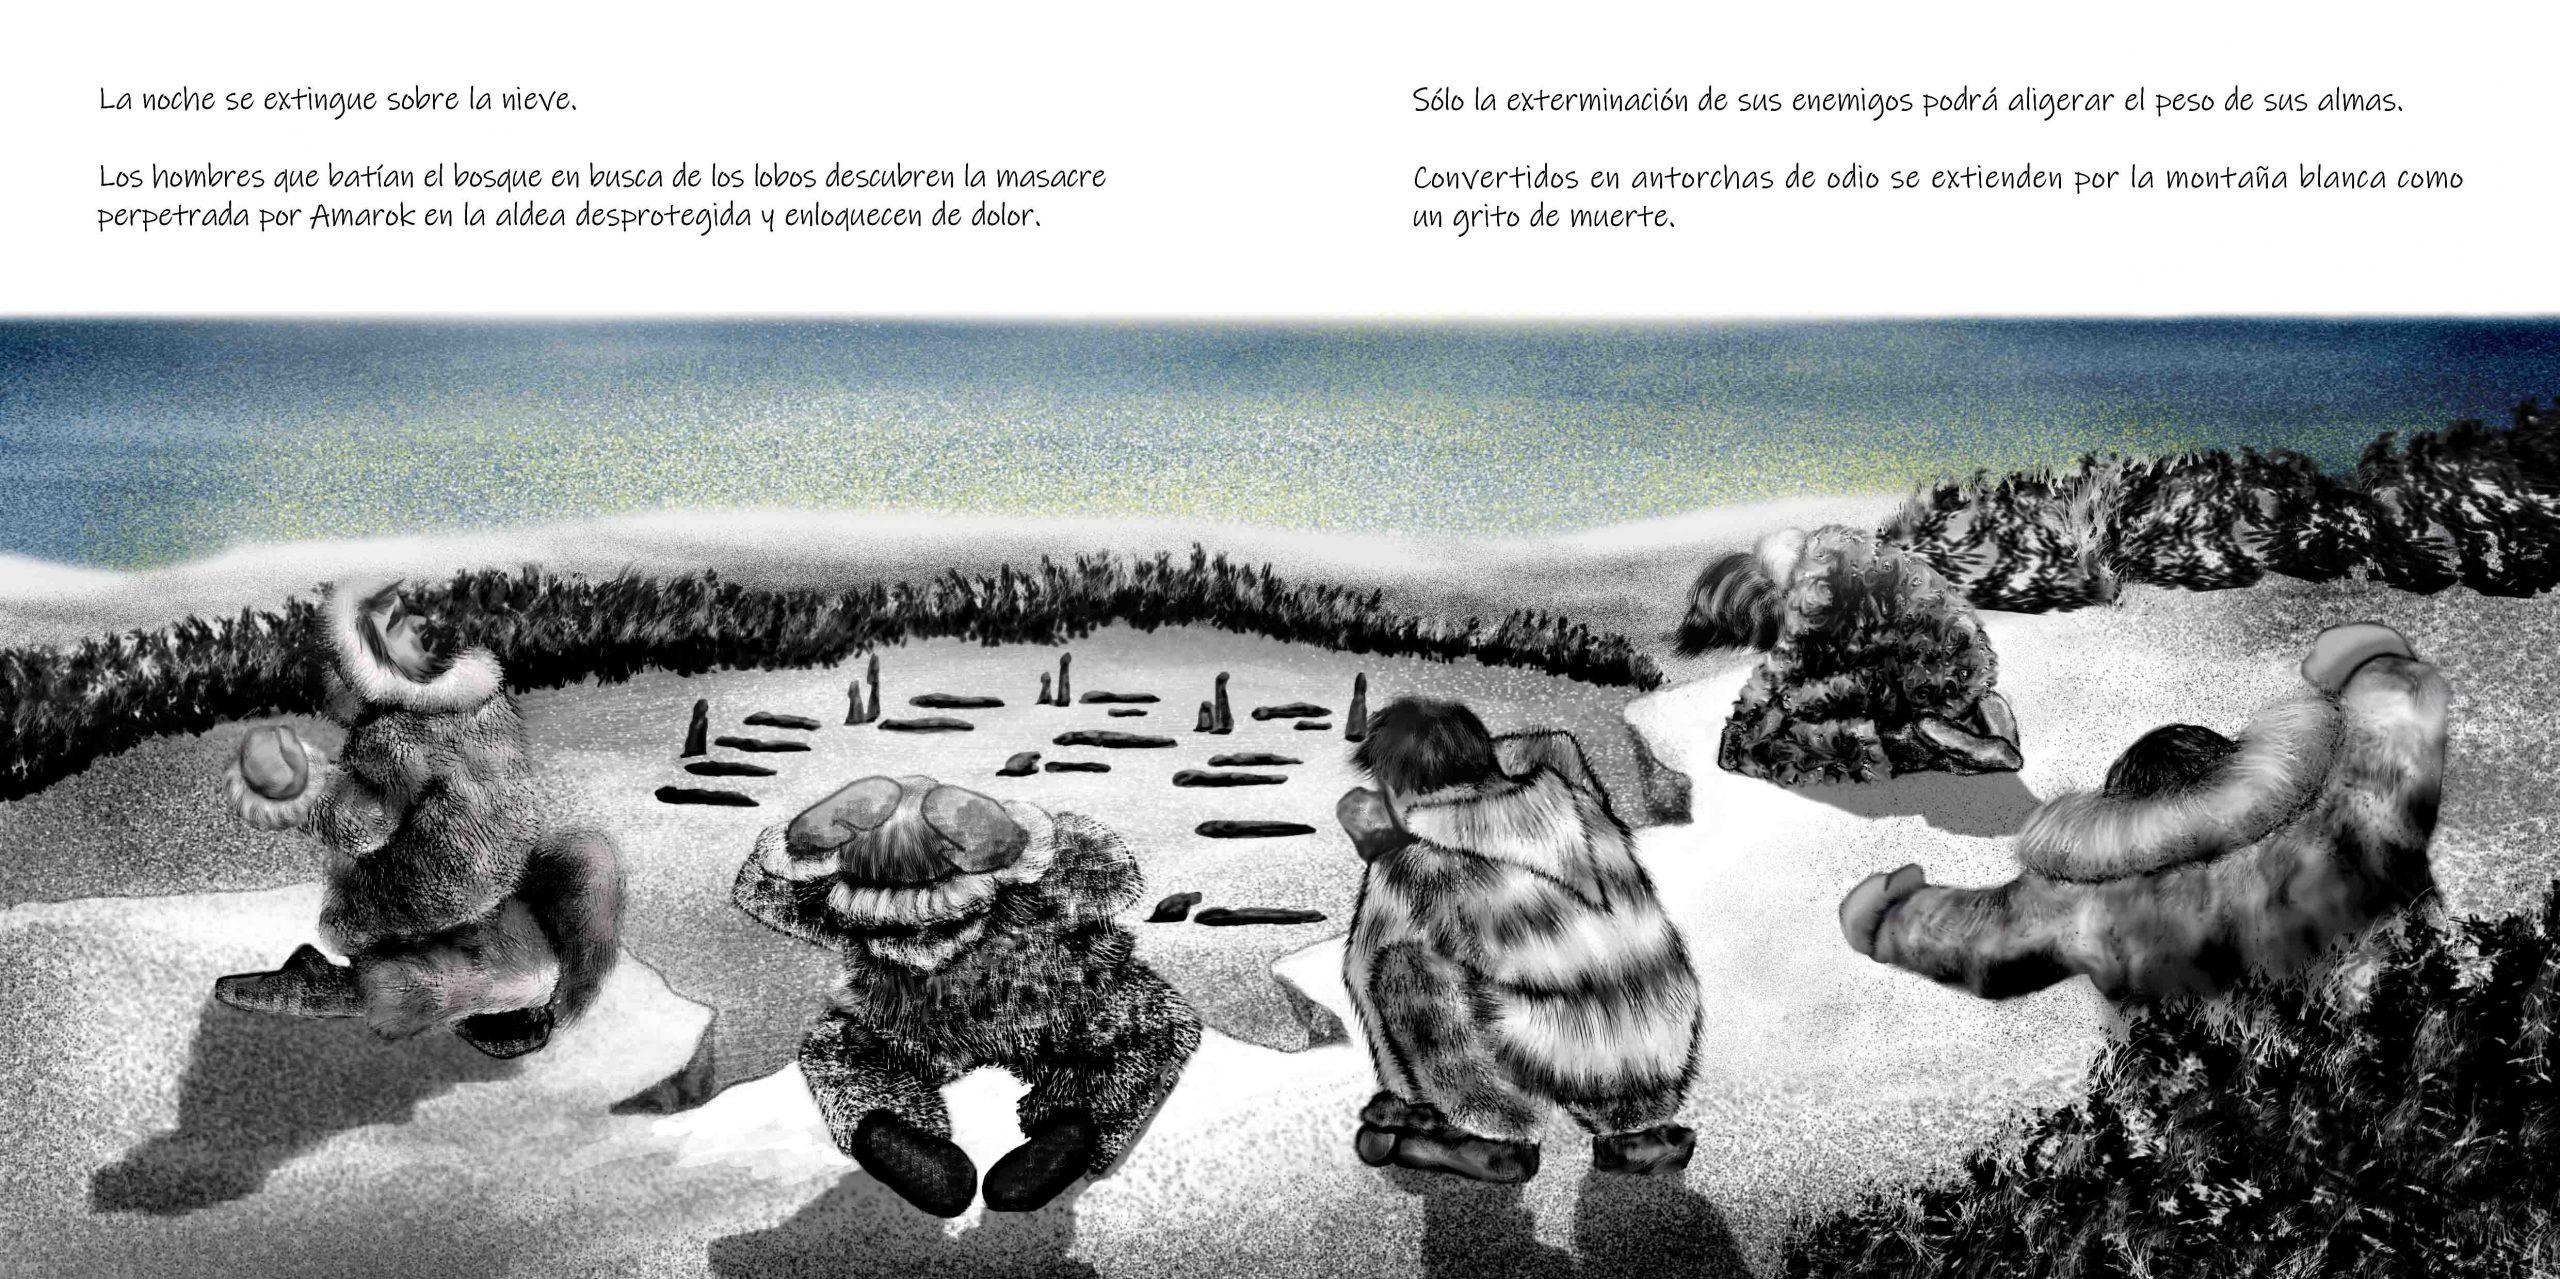 Amarok Illustrated Album by Vivian Leila Campillo page 22_23